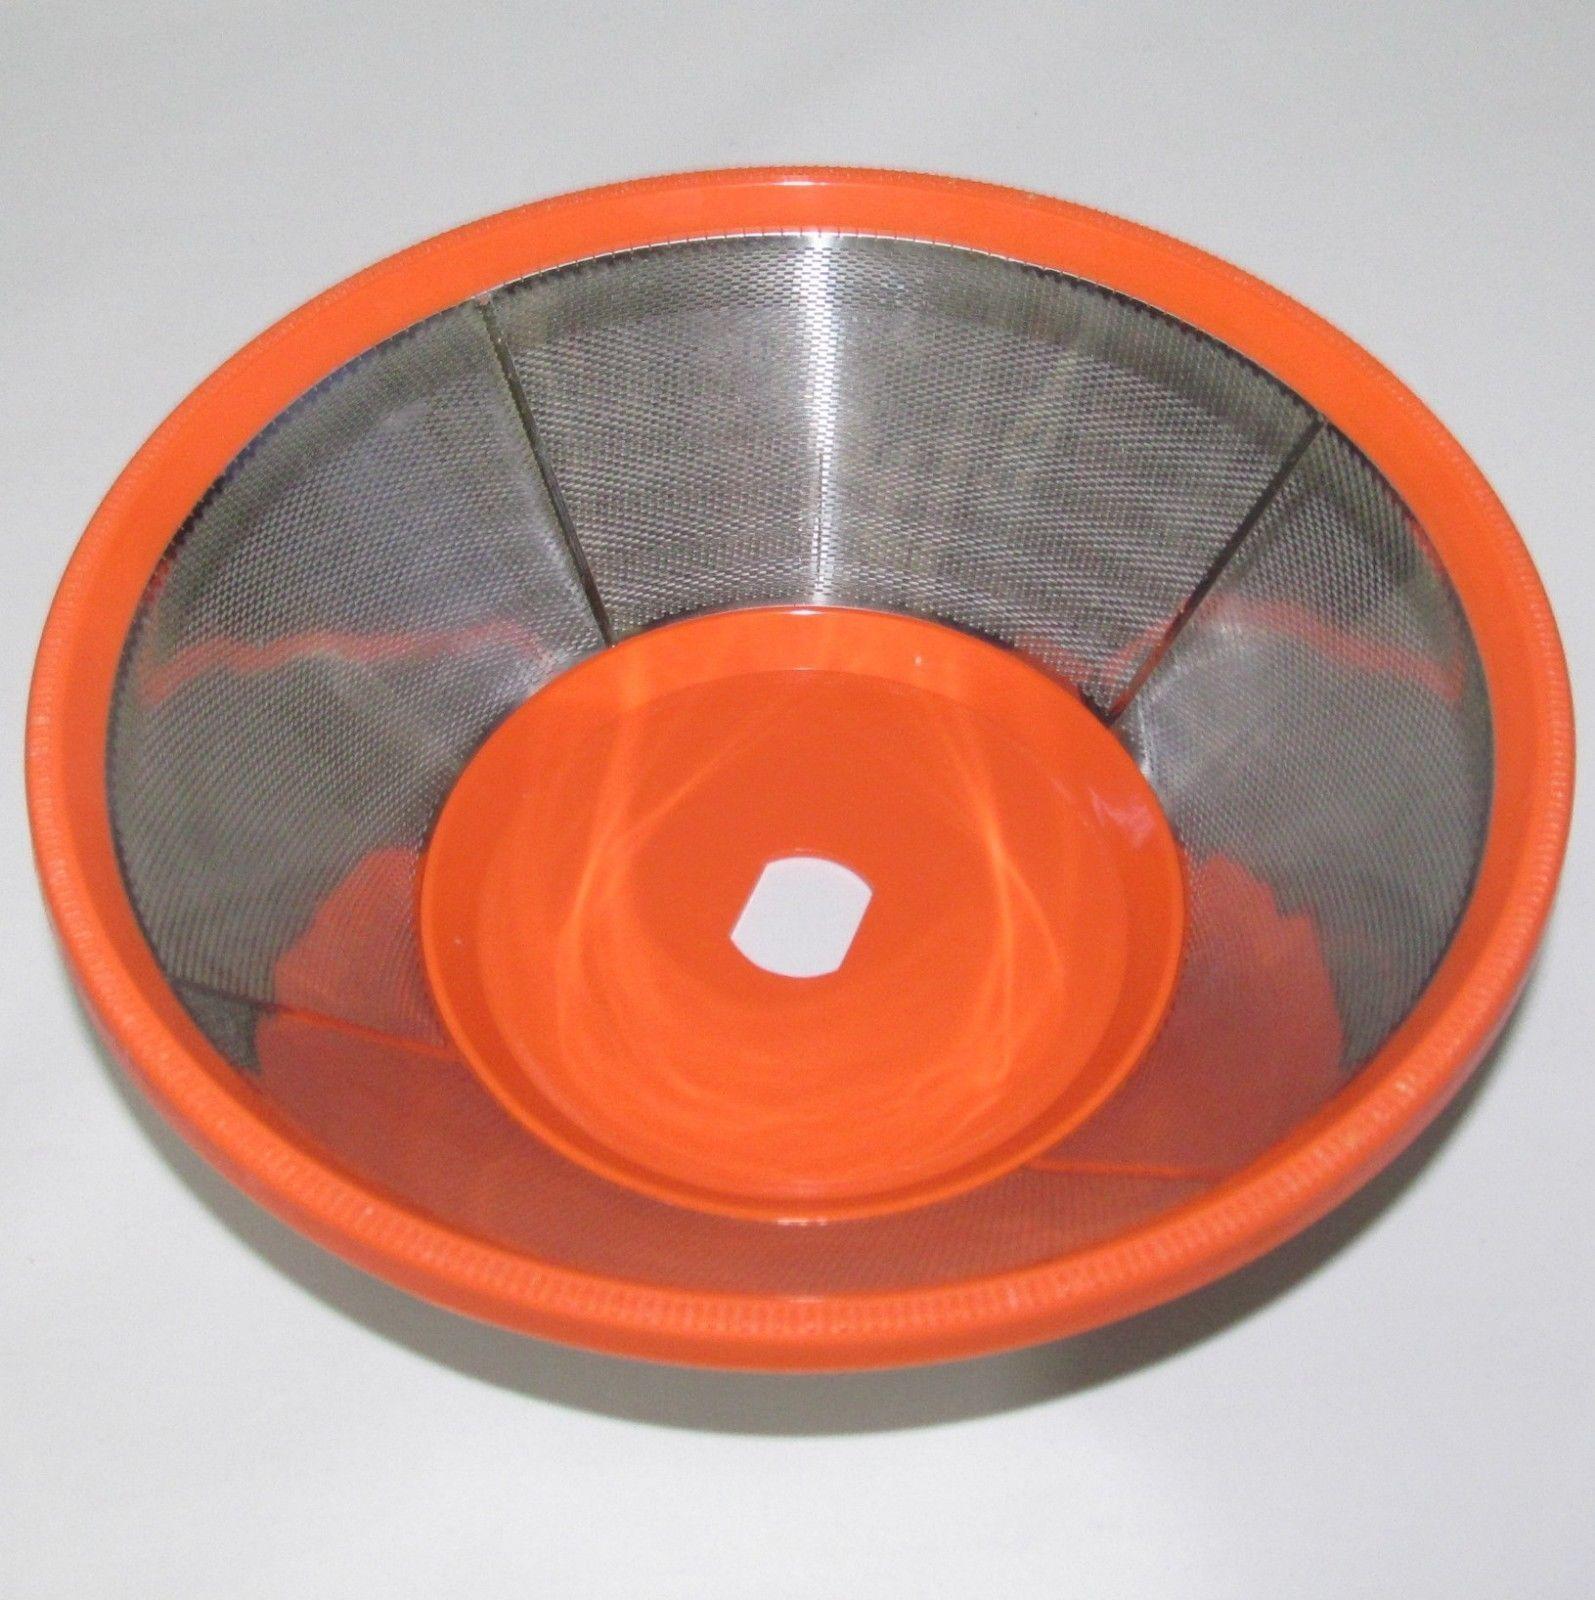 brand new filter for jack lalanne power